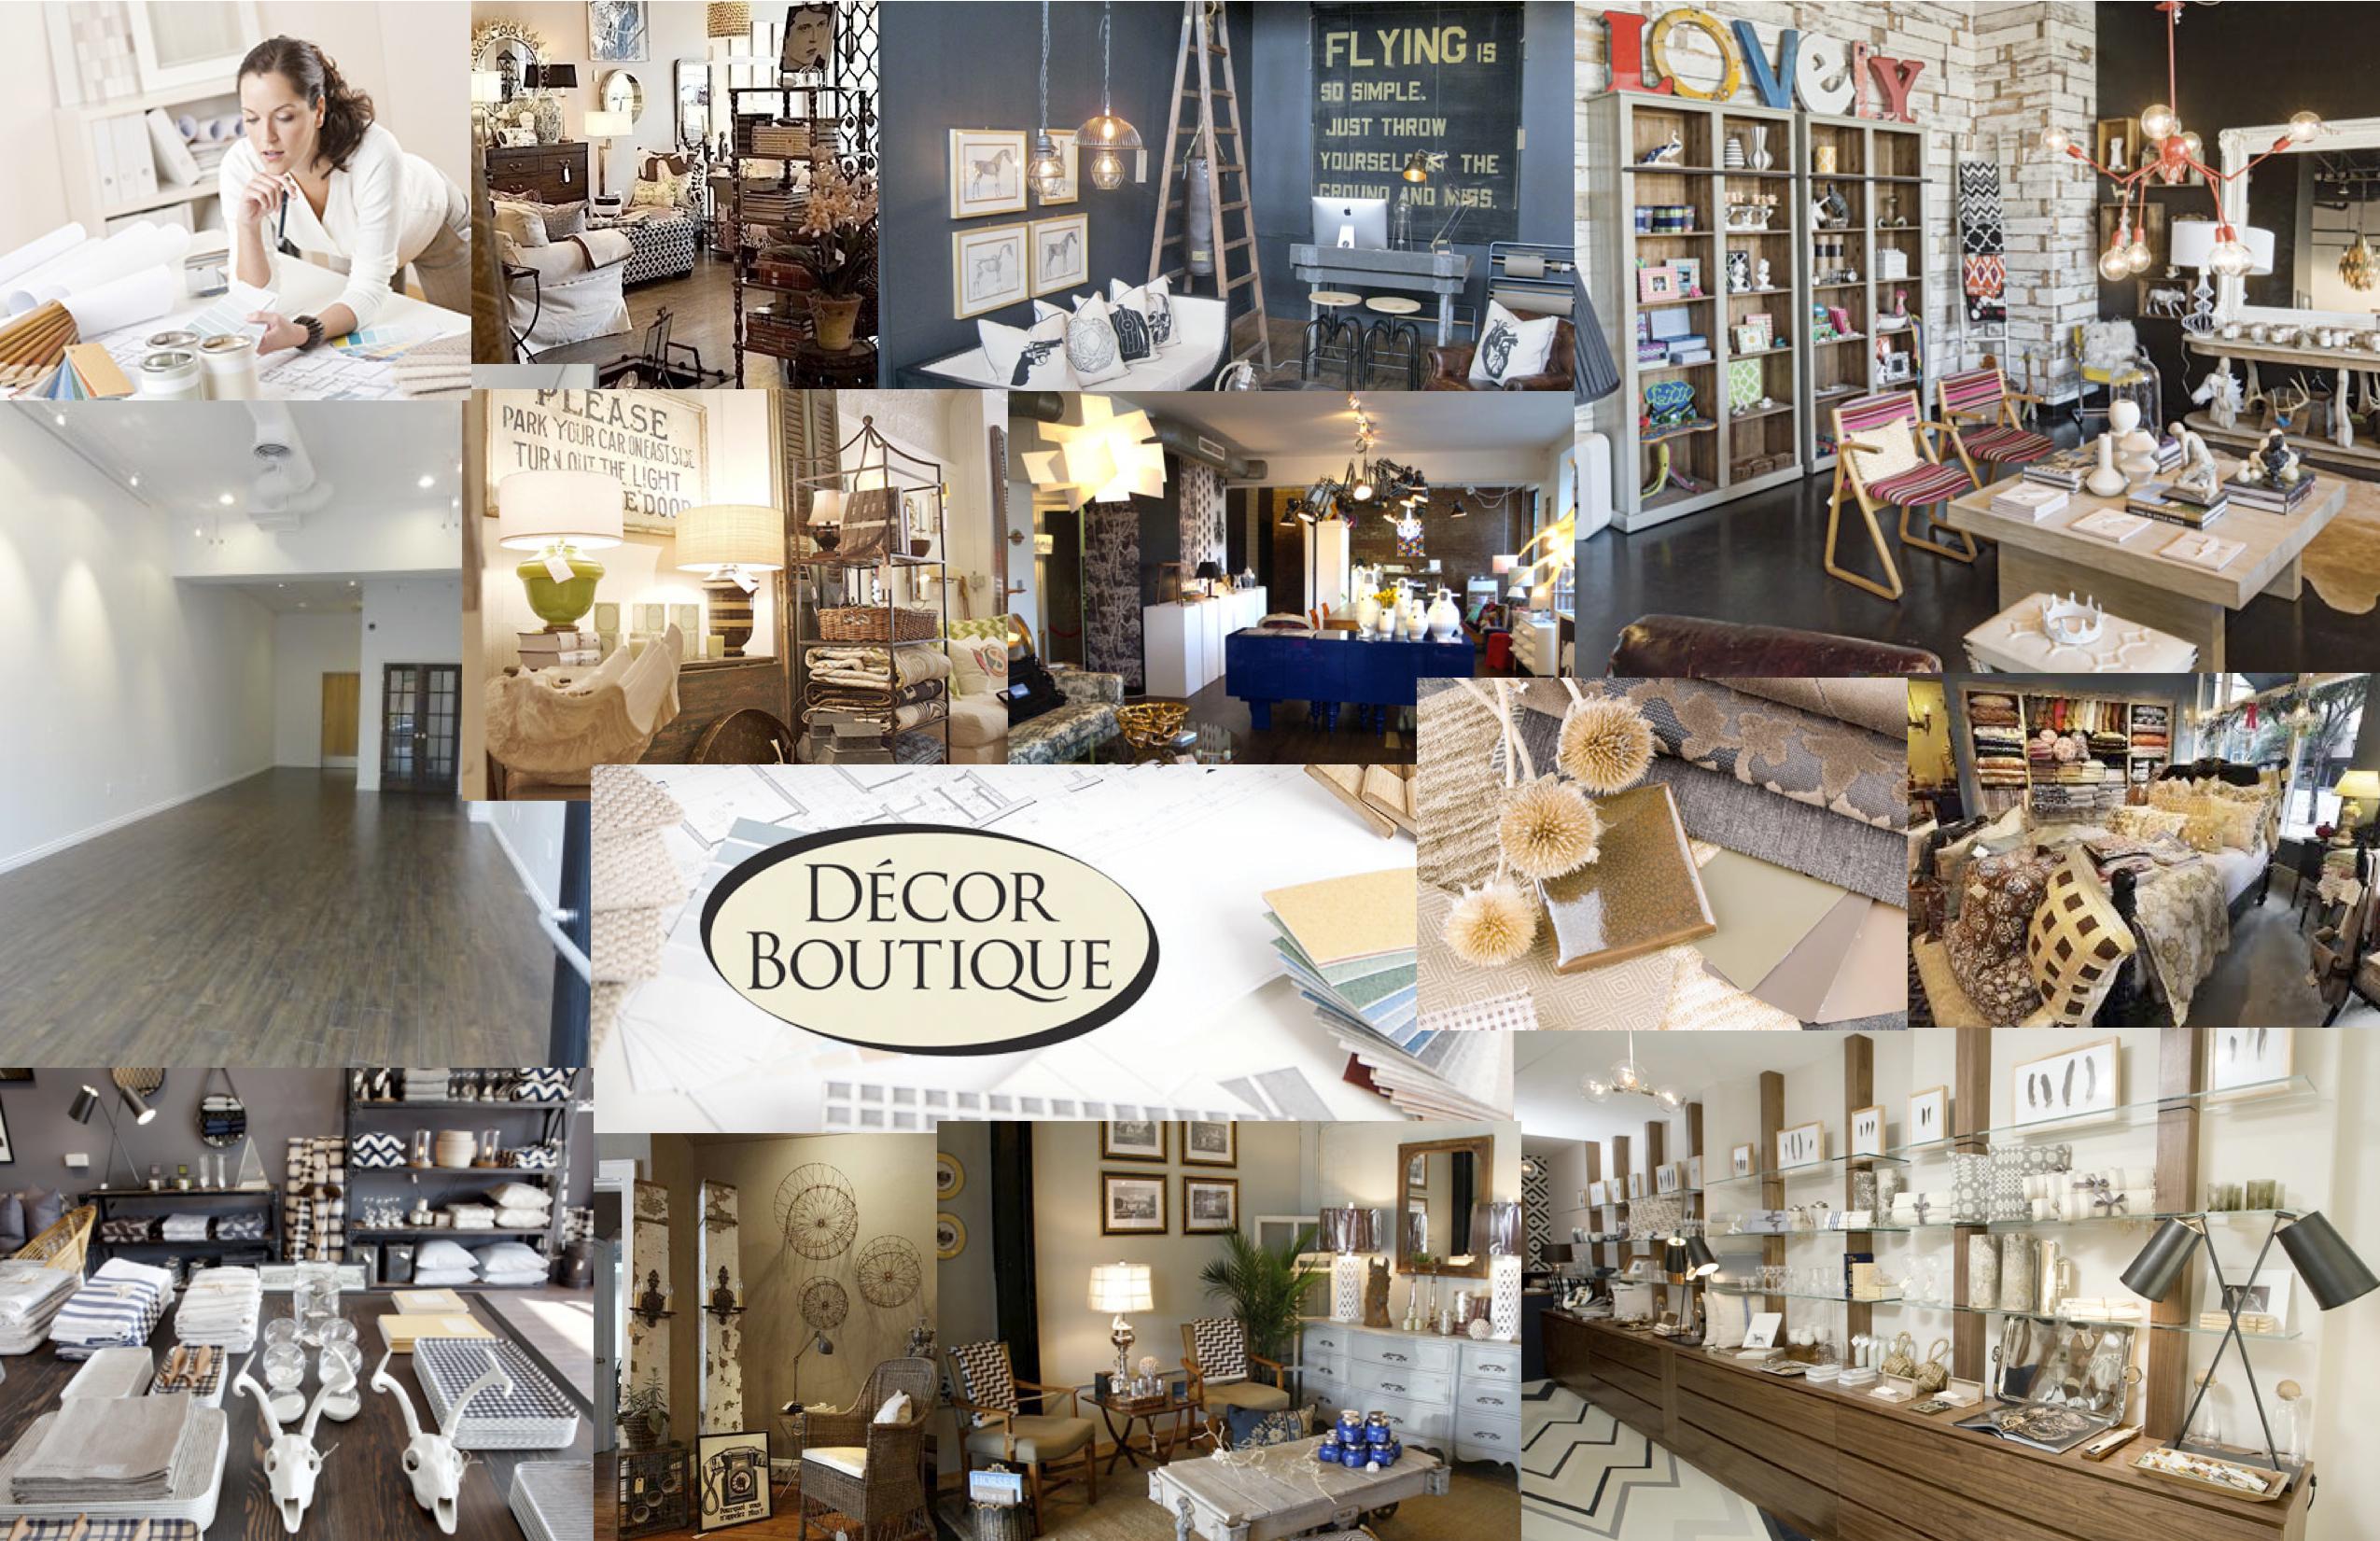 A blog neglected no more j patten interiors for Boutique decoration